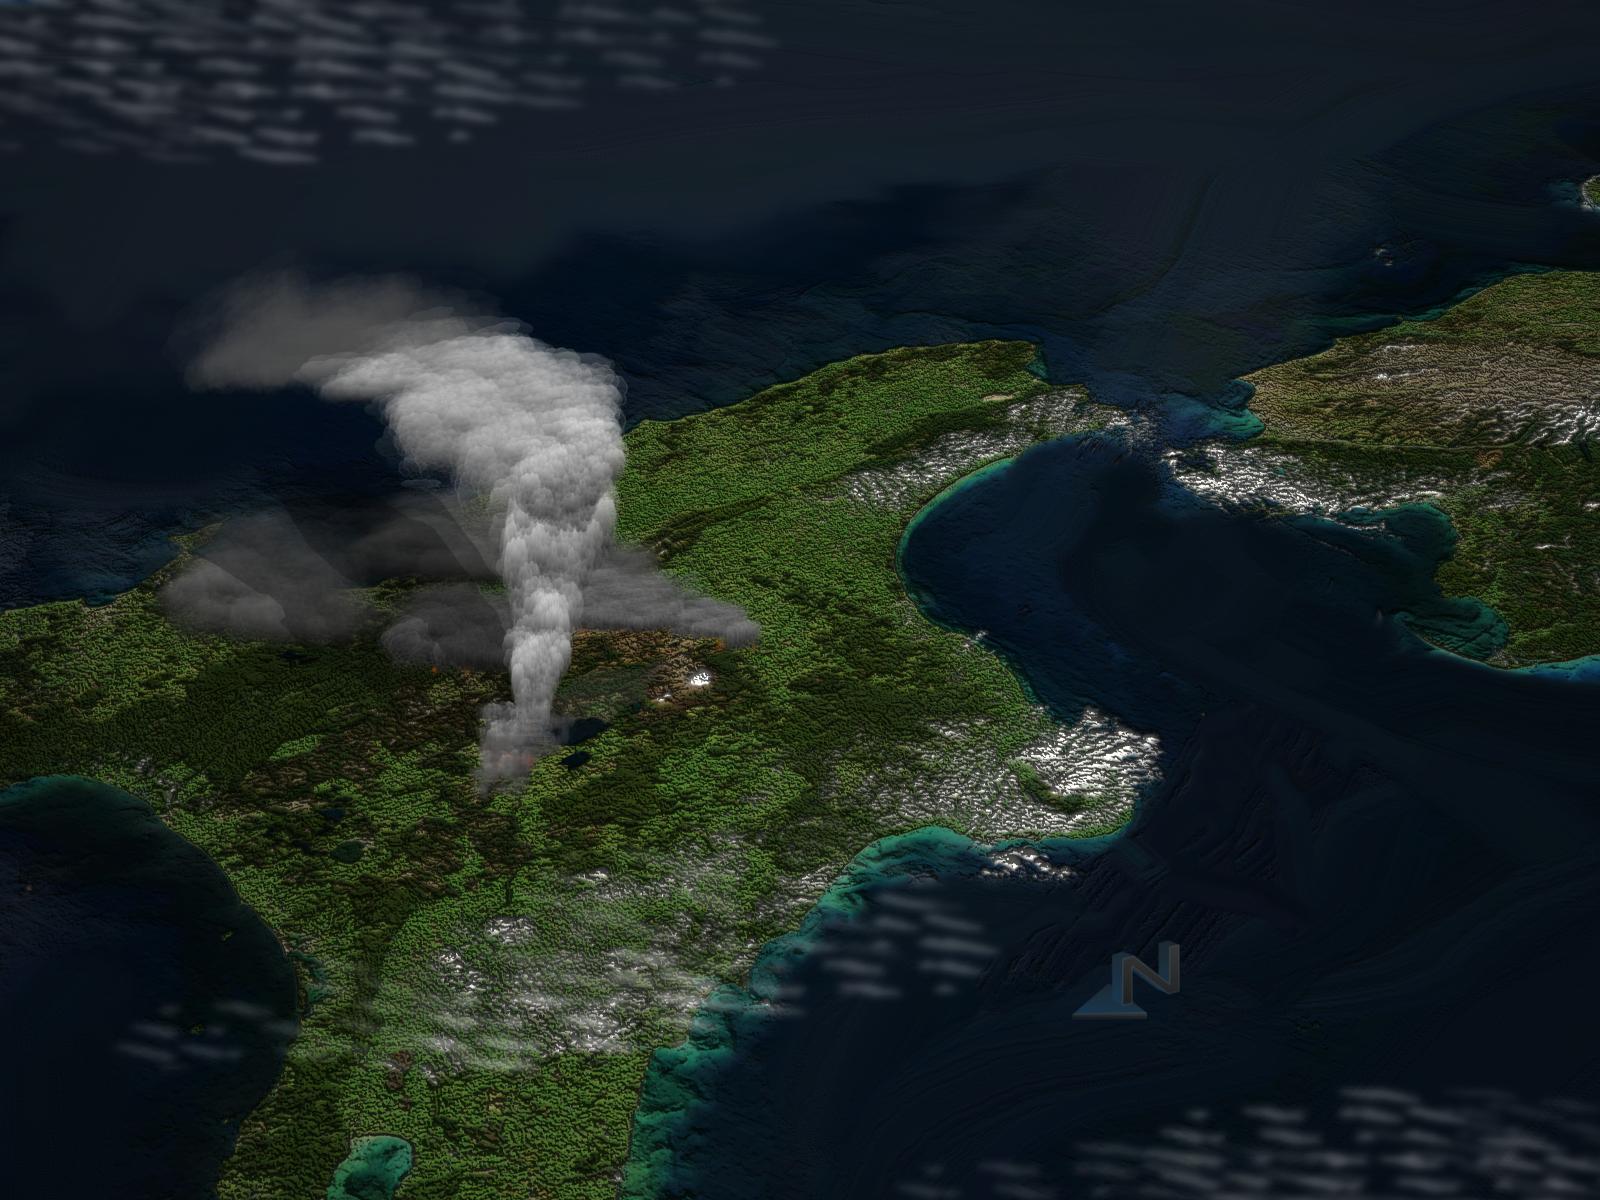 Oruanui New Zealand  city photo : oruanui eruption the oruanui eruption of new zealand s taupo volcano ...